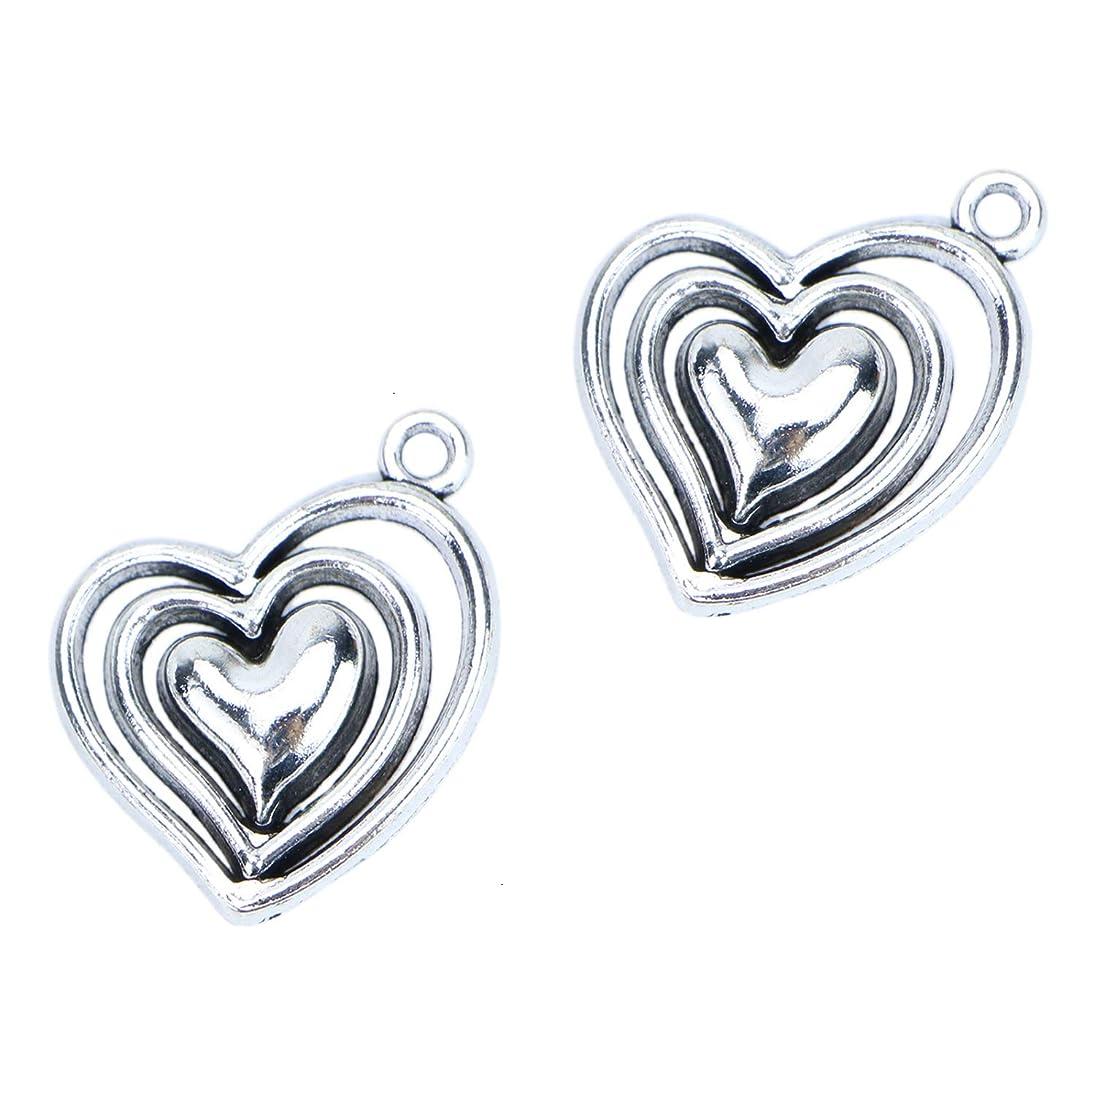 Monrocco 40 Pcs Antique Silver Hollow Filigree Heart Charm Pendants for Bracelets Jewelry Making dwoibxloybn871